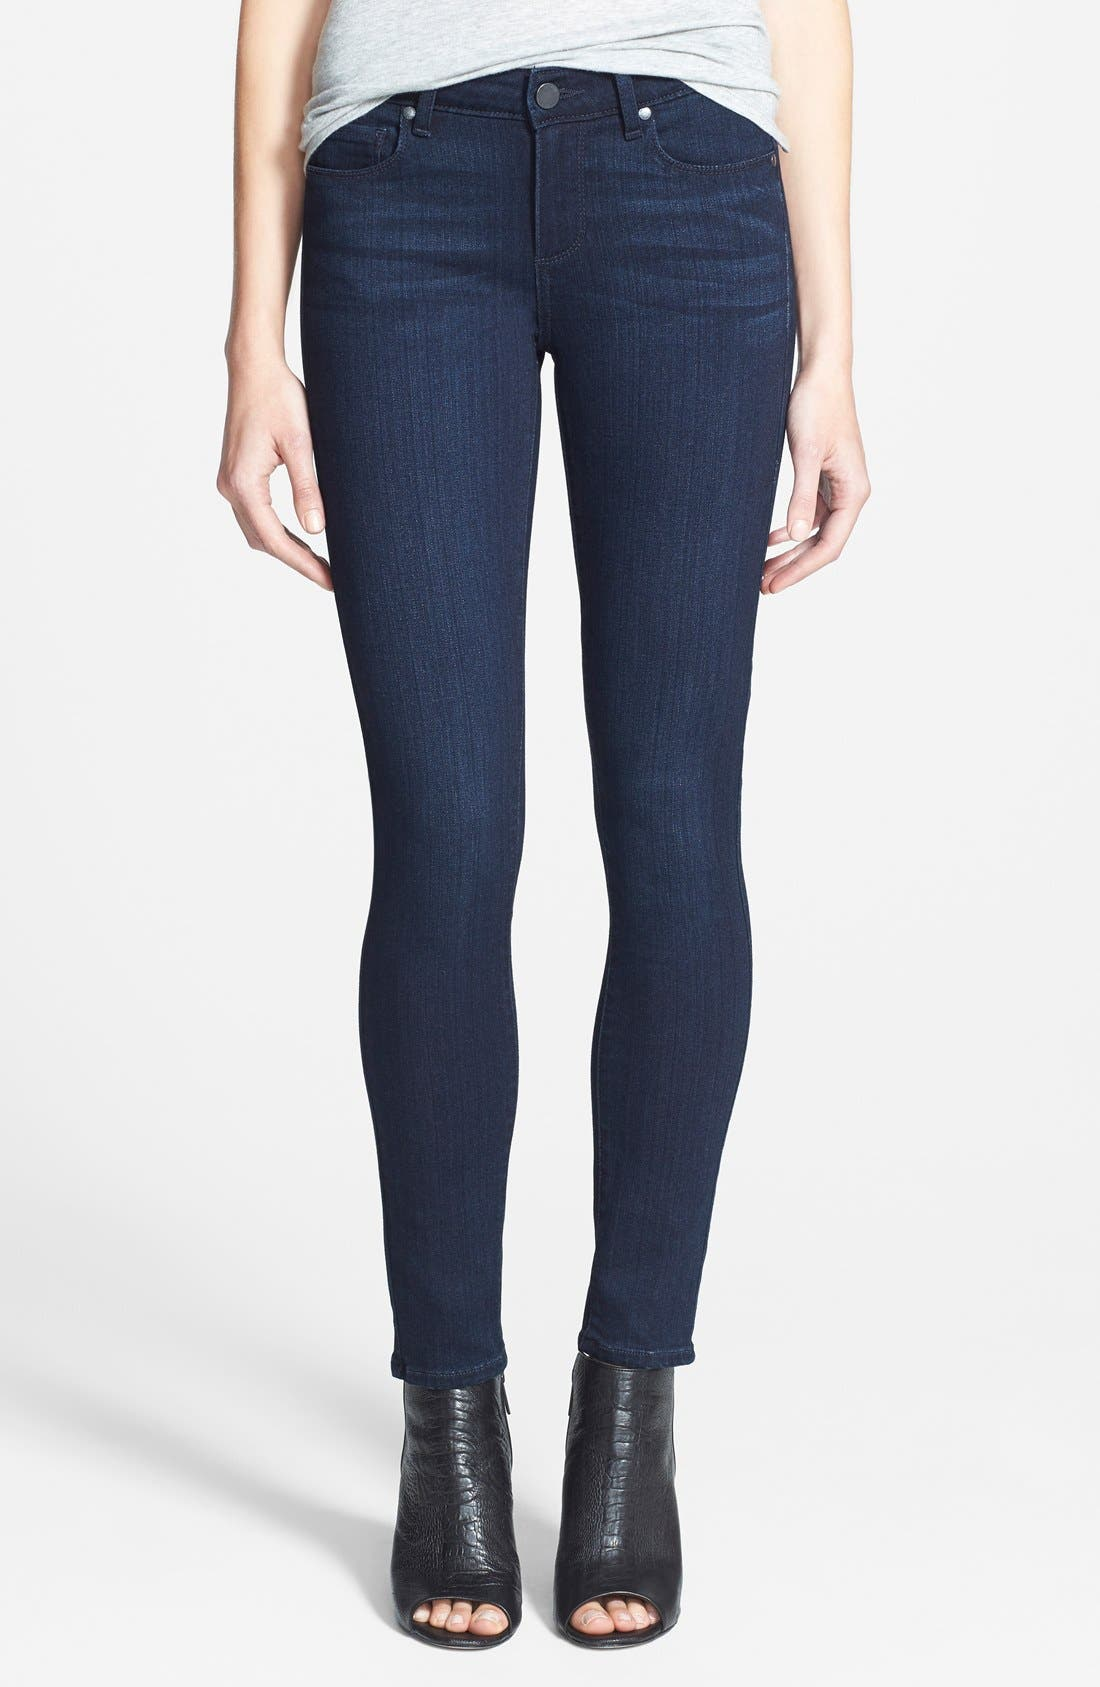 Main Image - PAIGE Transcend - Verdugo Ankle Jeans (Mae)